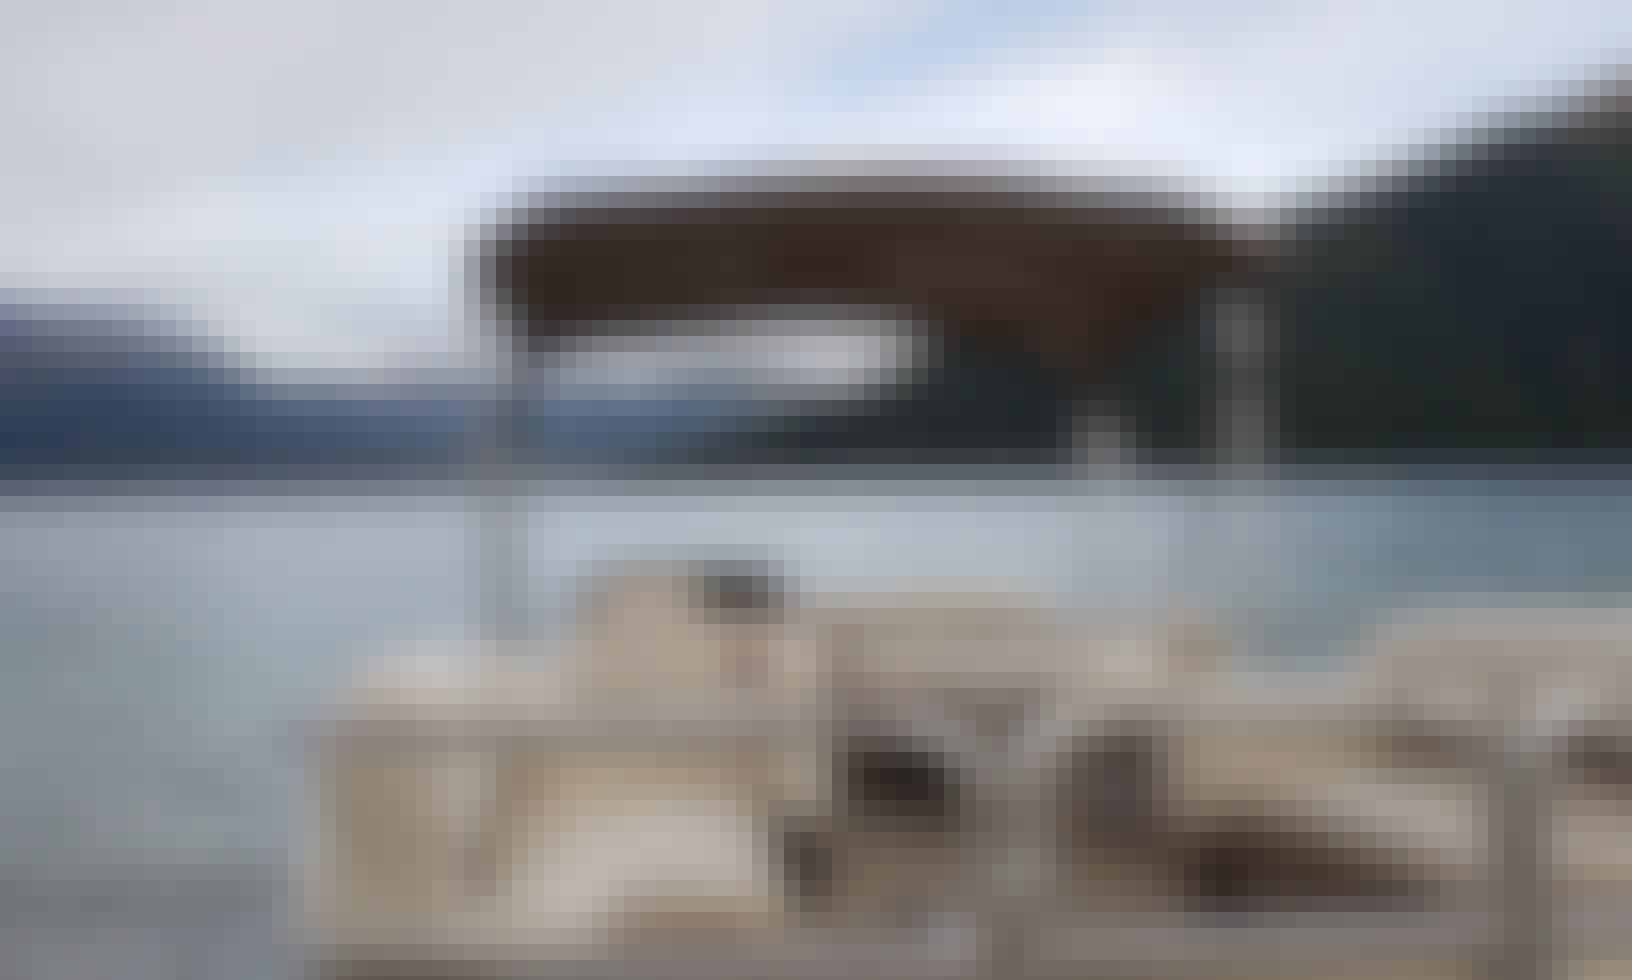 21' Pontoon Boat in the Yukon